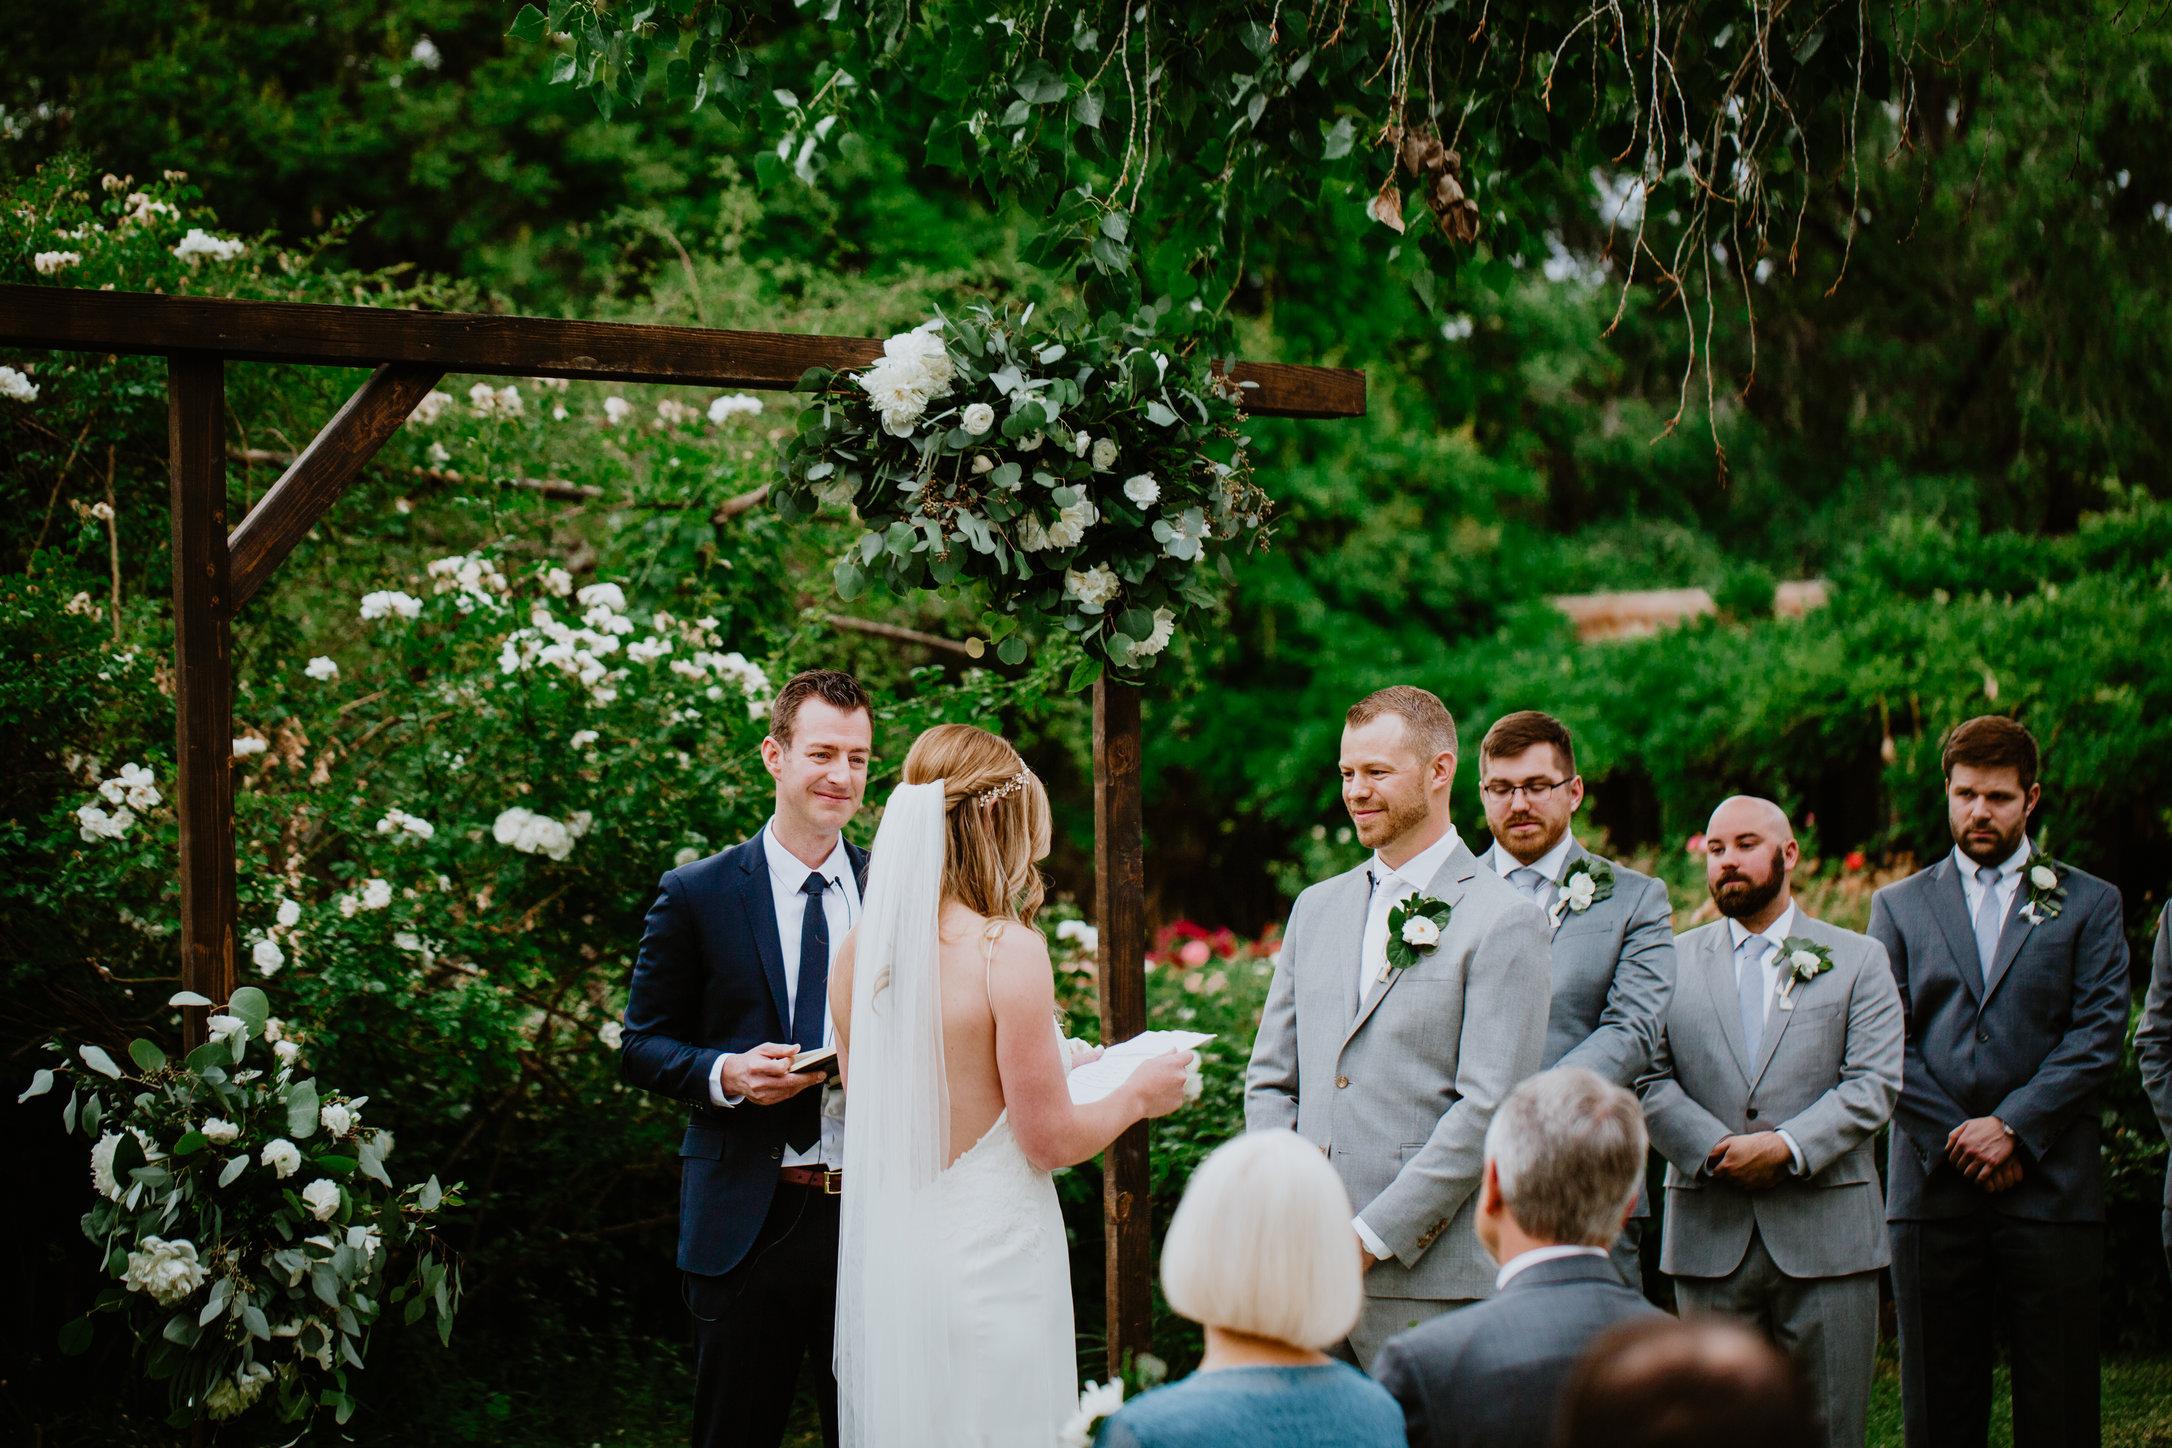 DandA-wedding-276.jpg